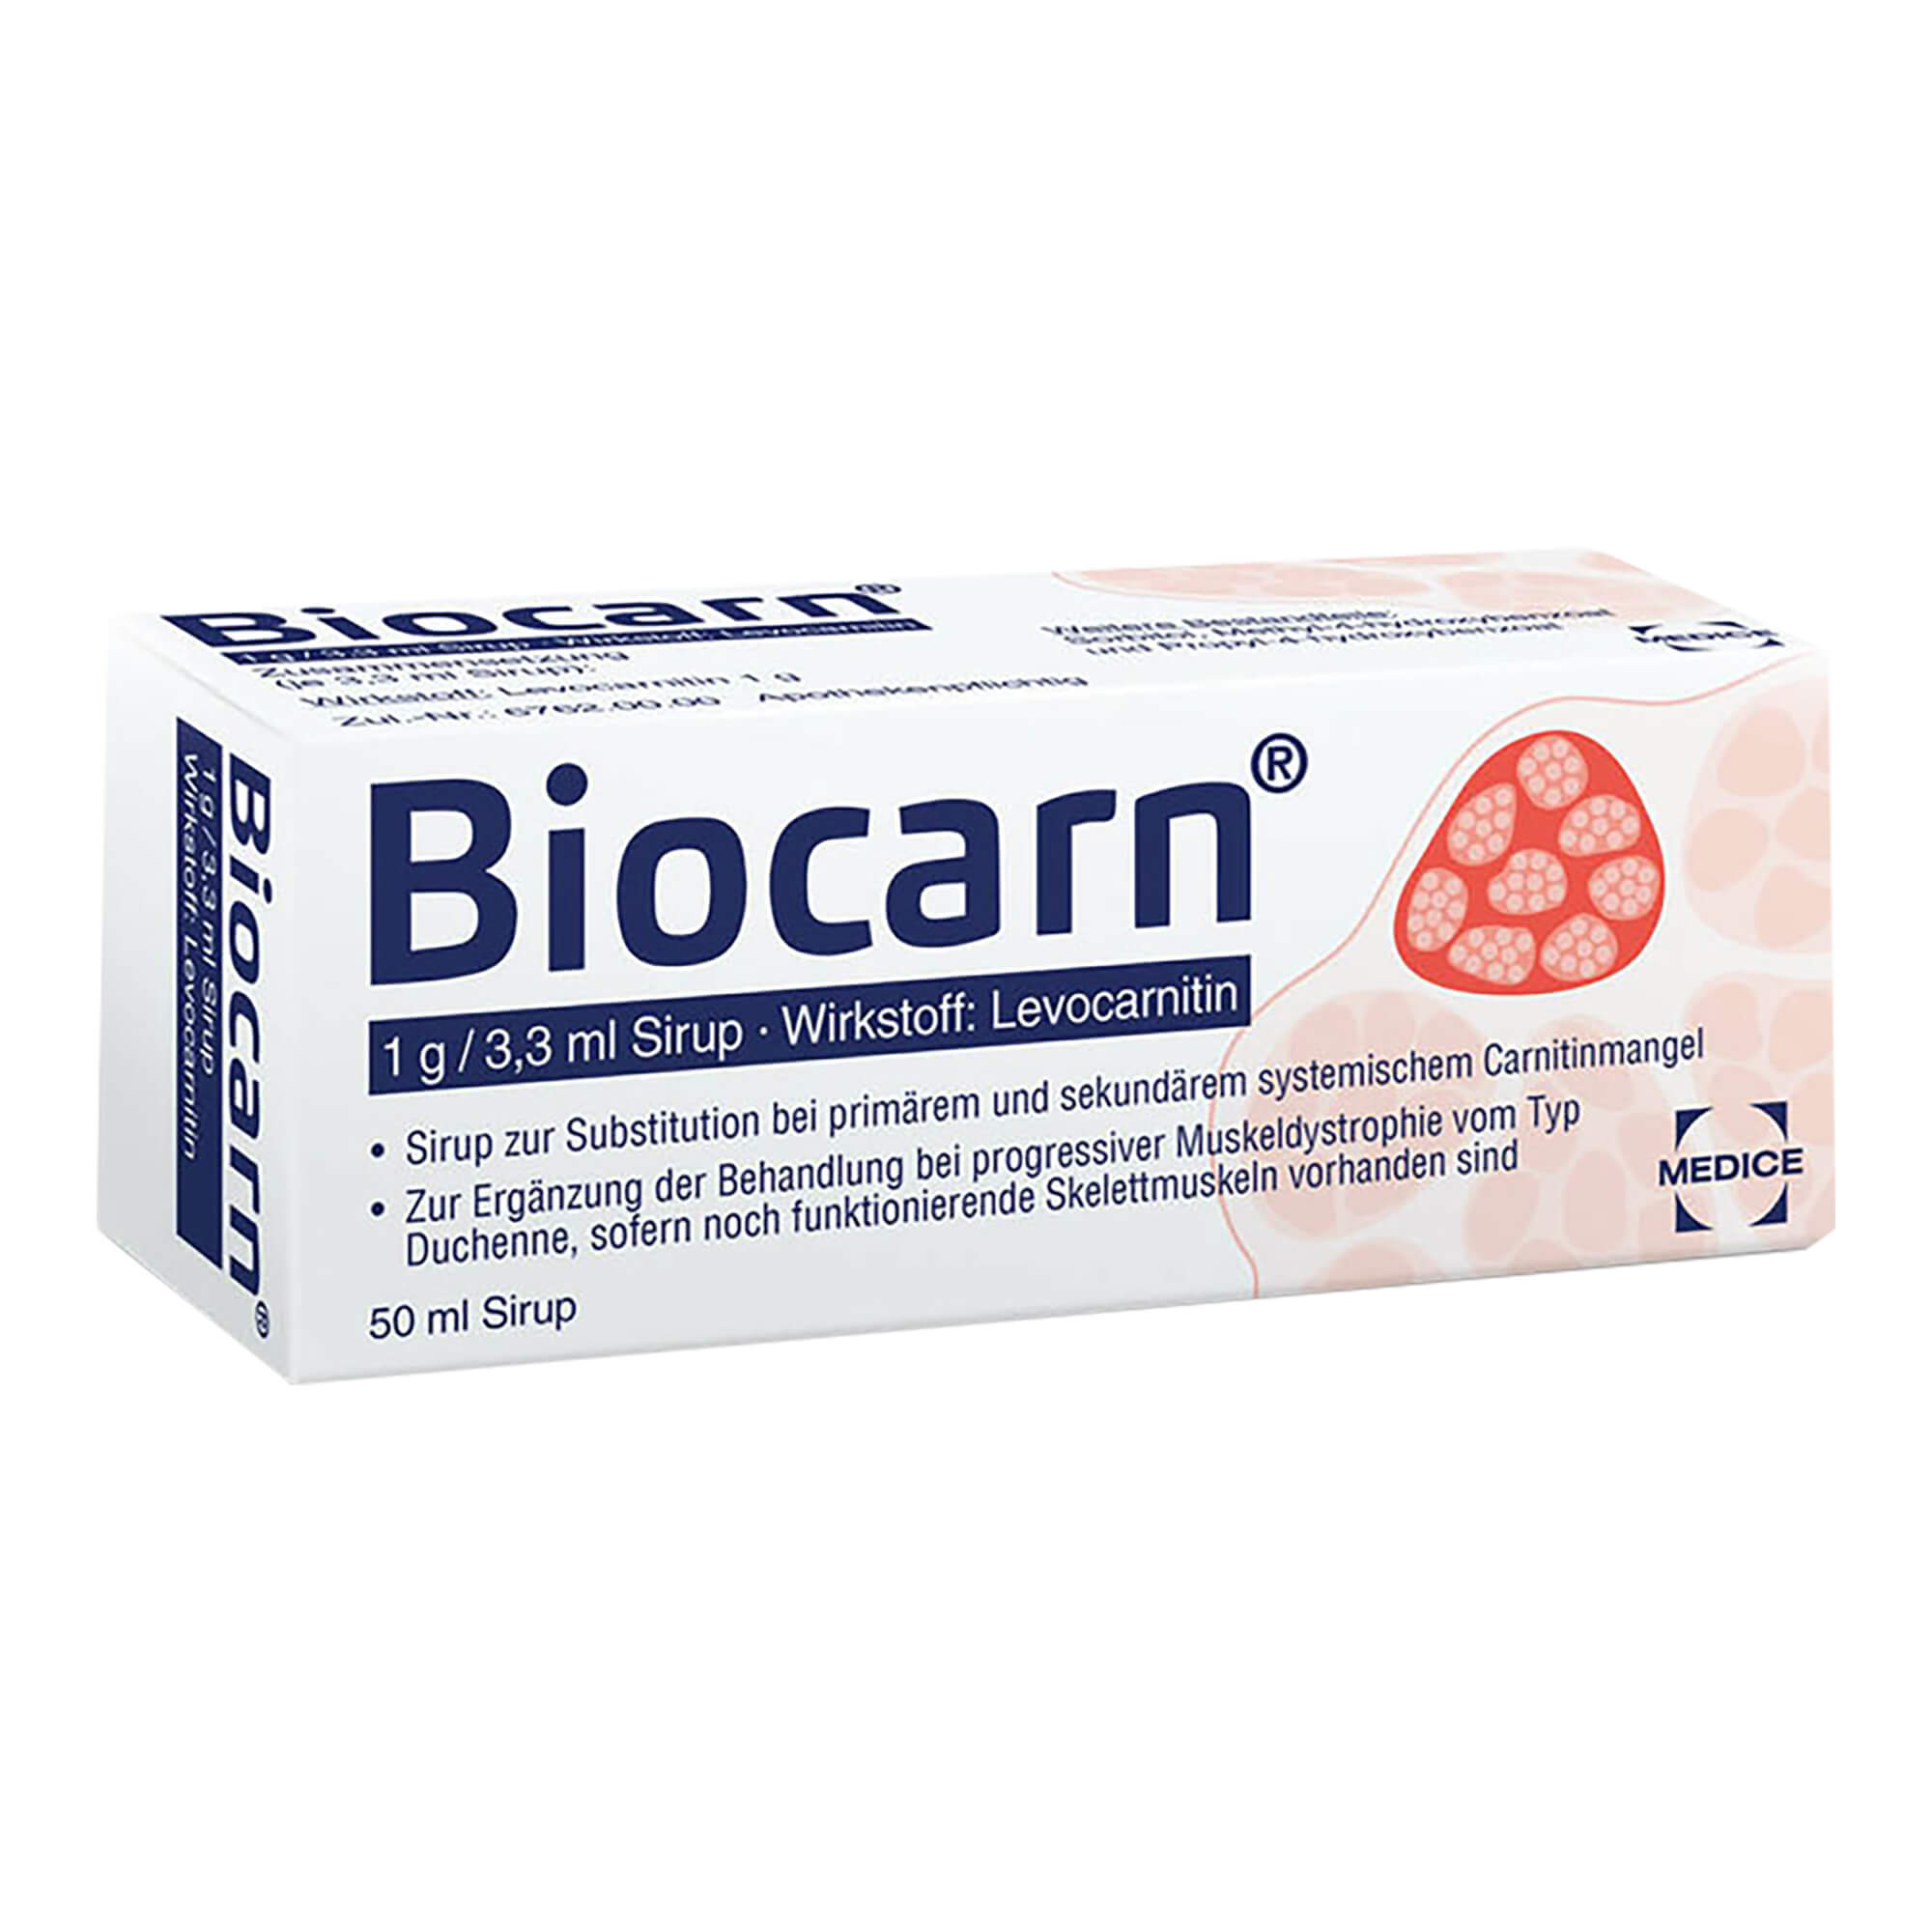 Biocarn Sirup 50 ml